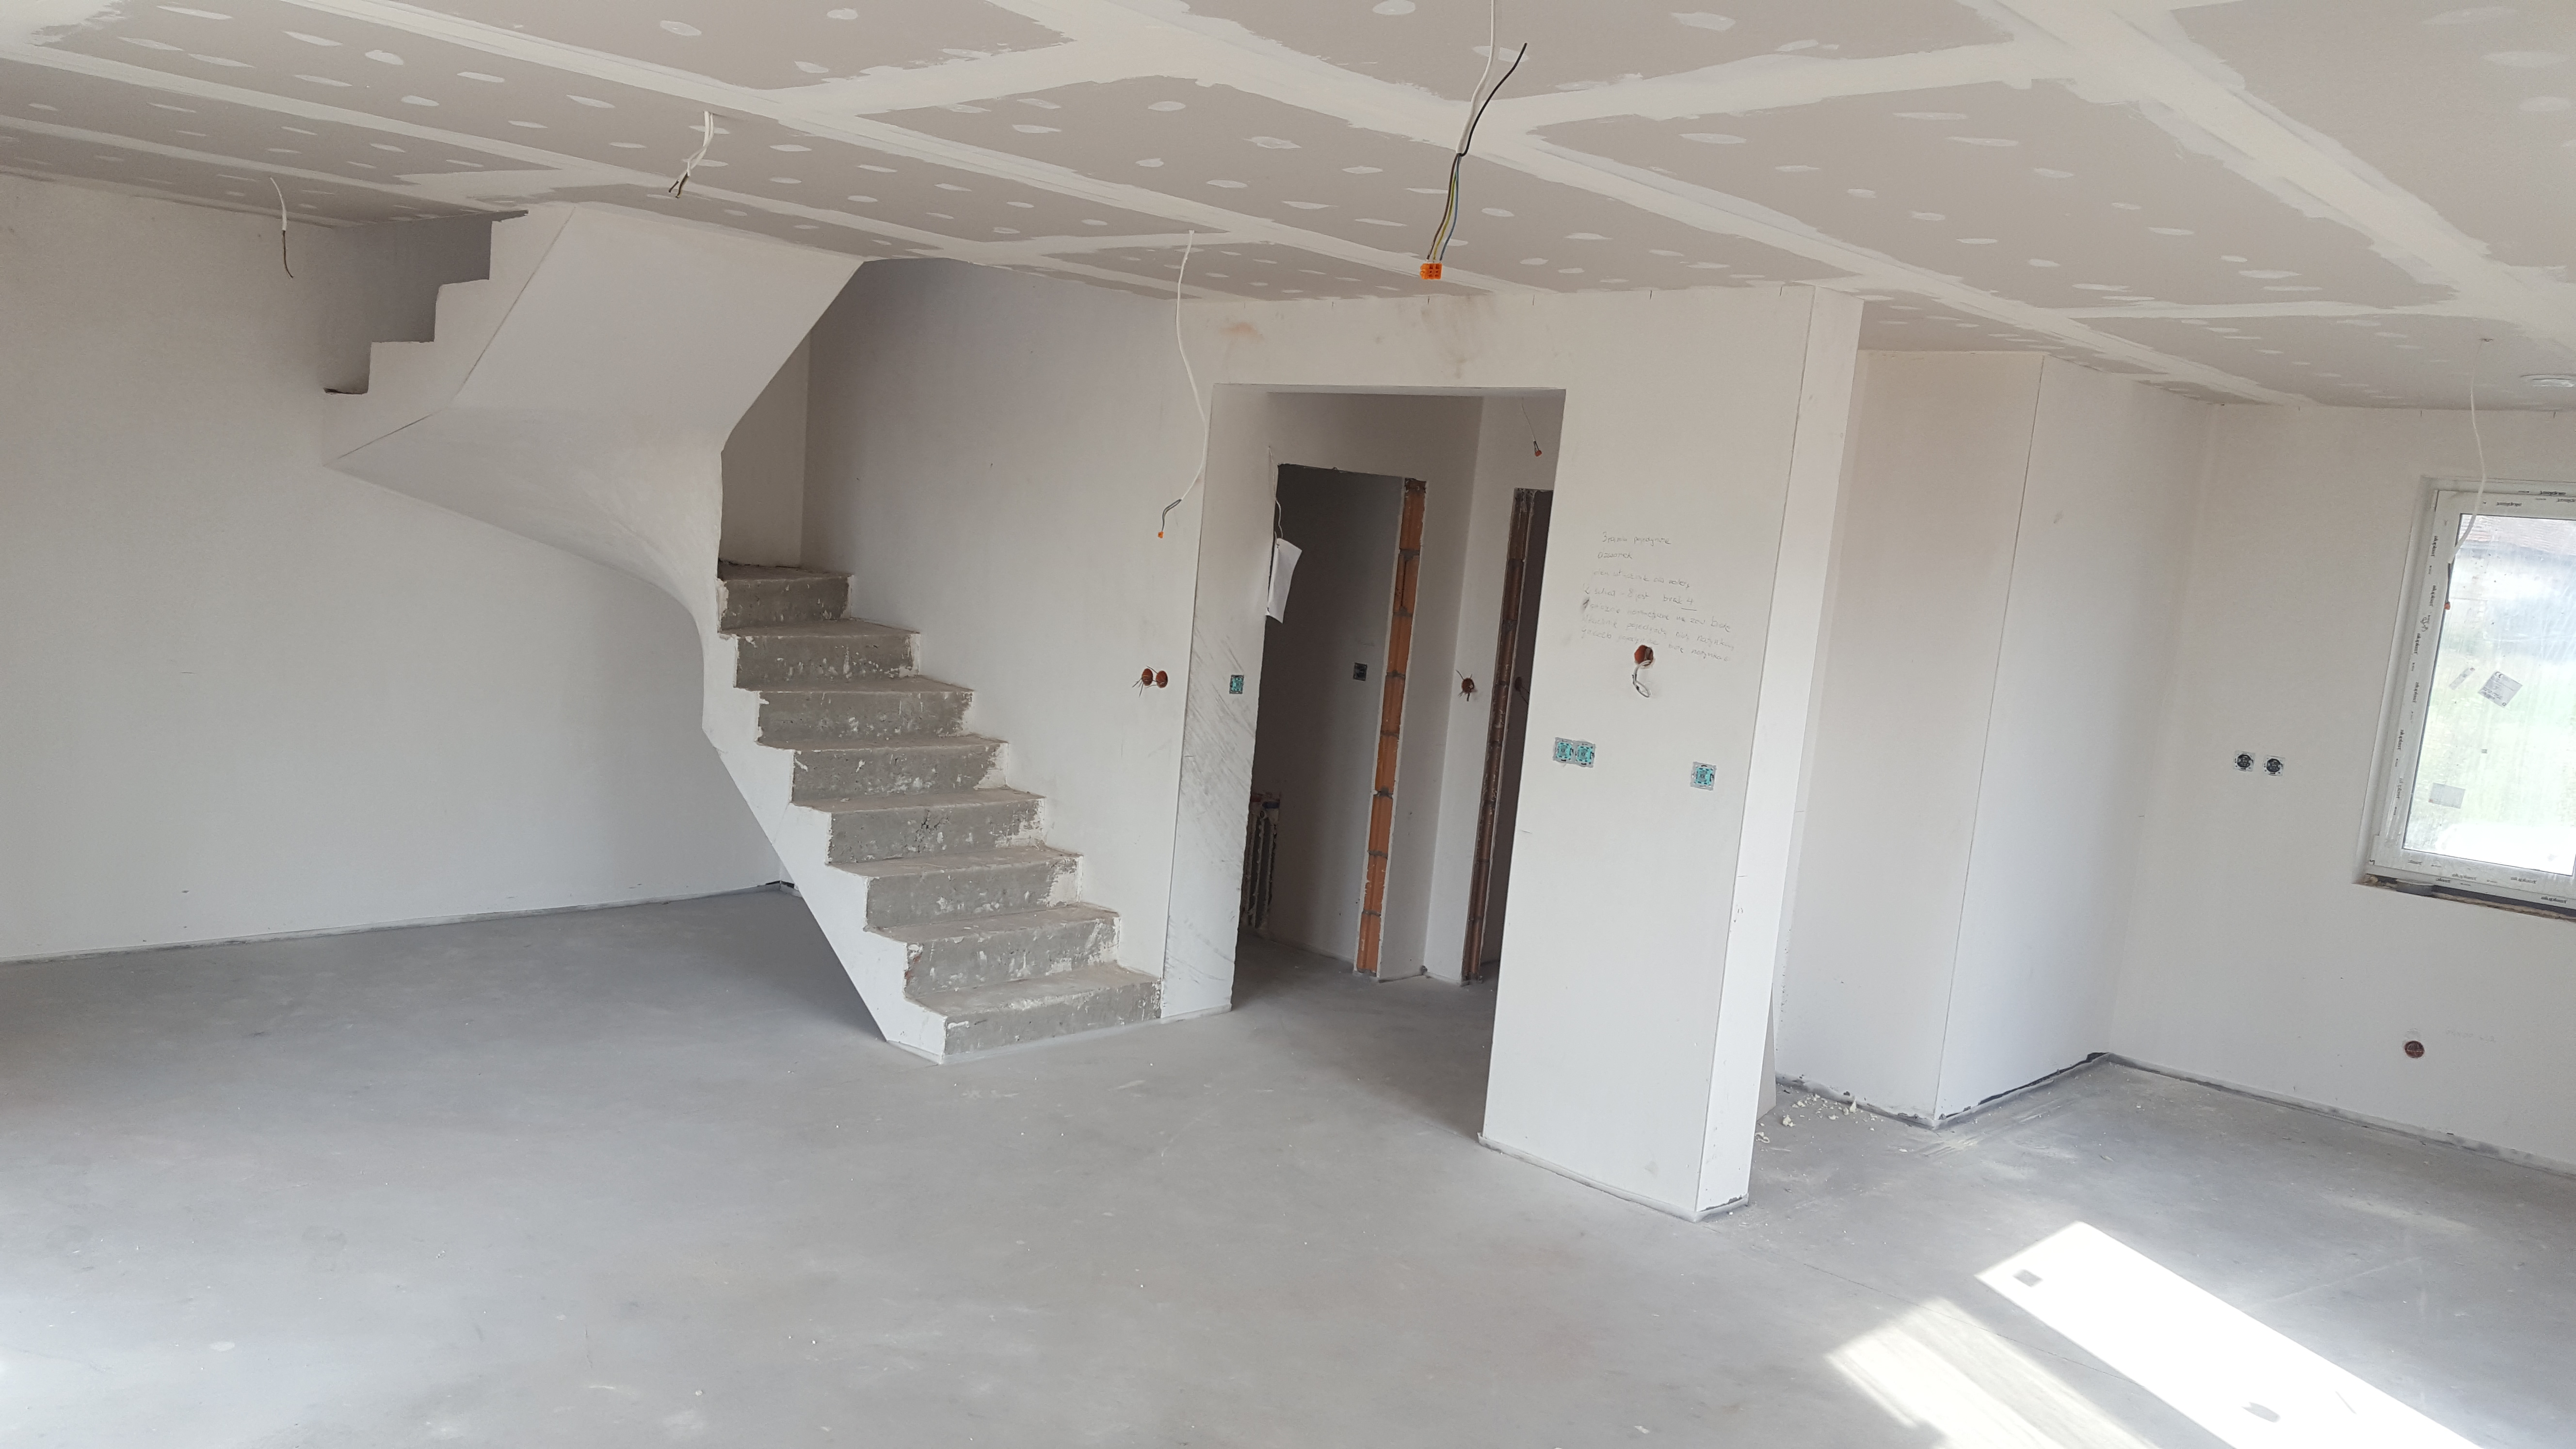 4 Rooms Rooms,2 BathroomsBathrooms,Domy,Sprzedaż,1027